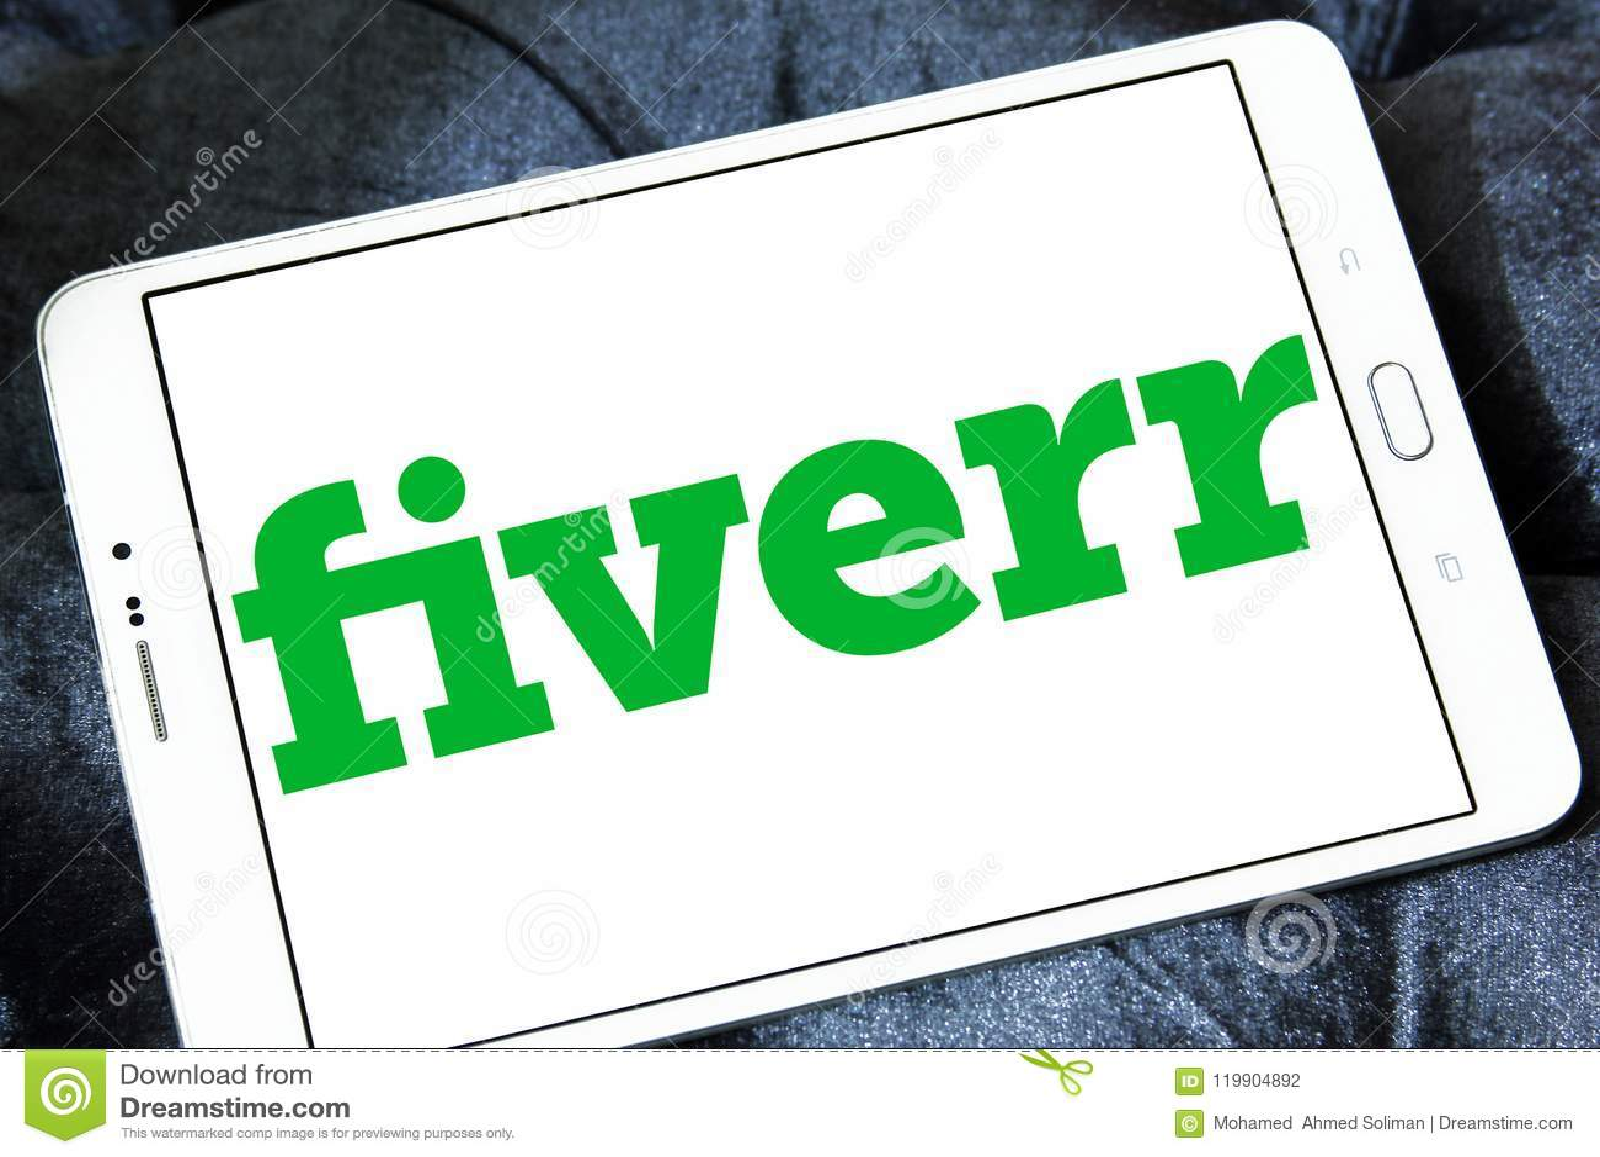 Fiverr company logo editorial photography  Image of motto